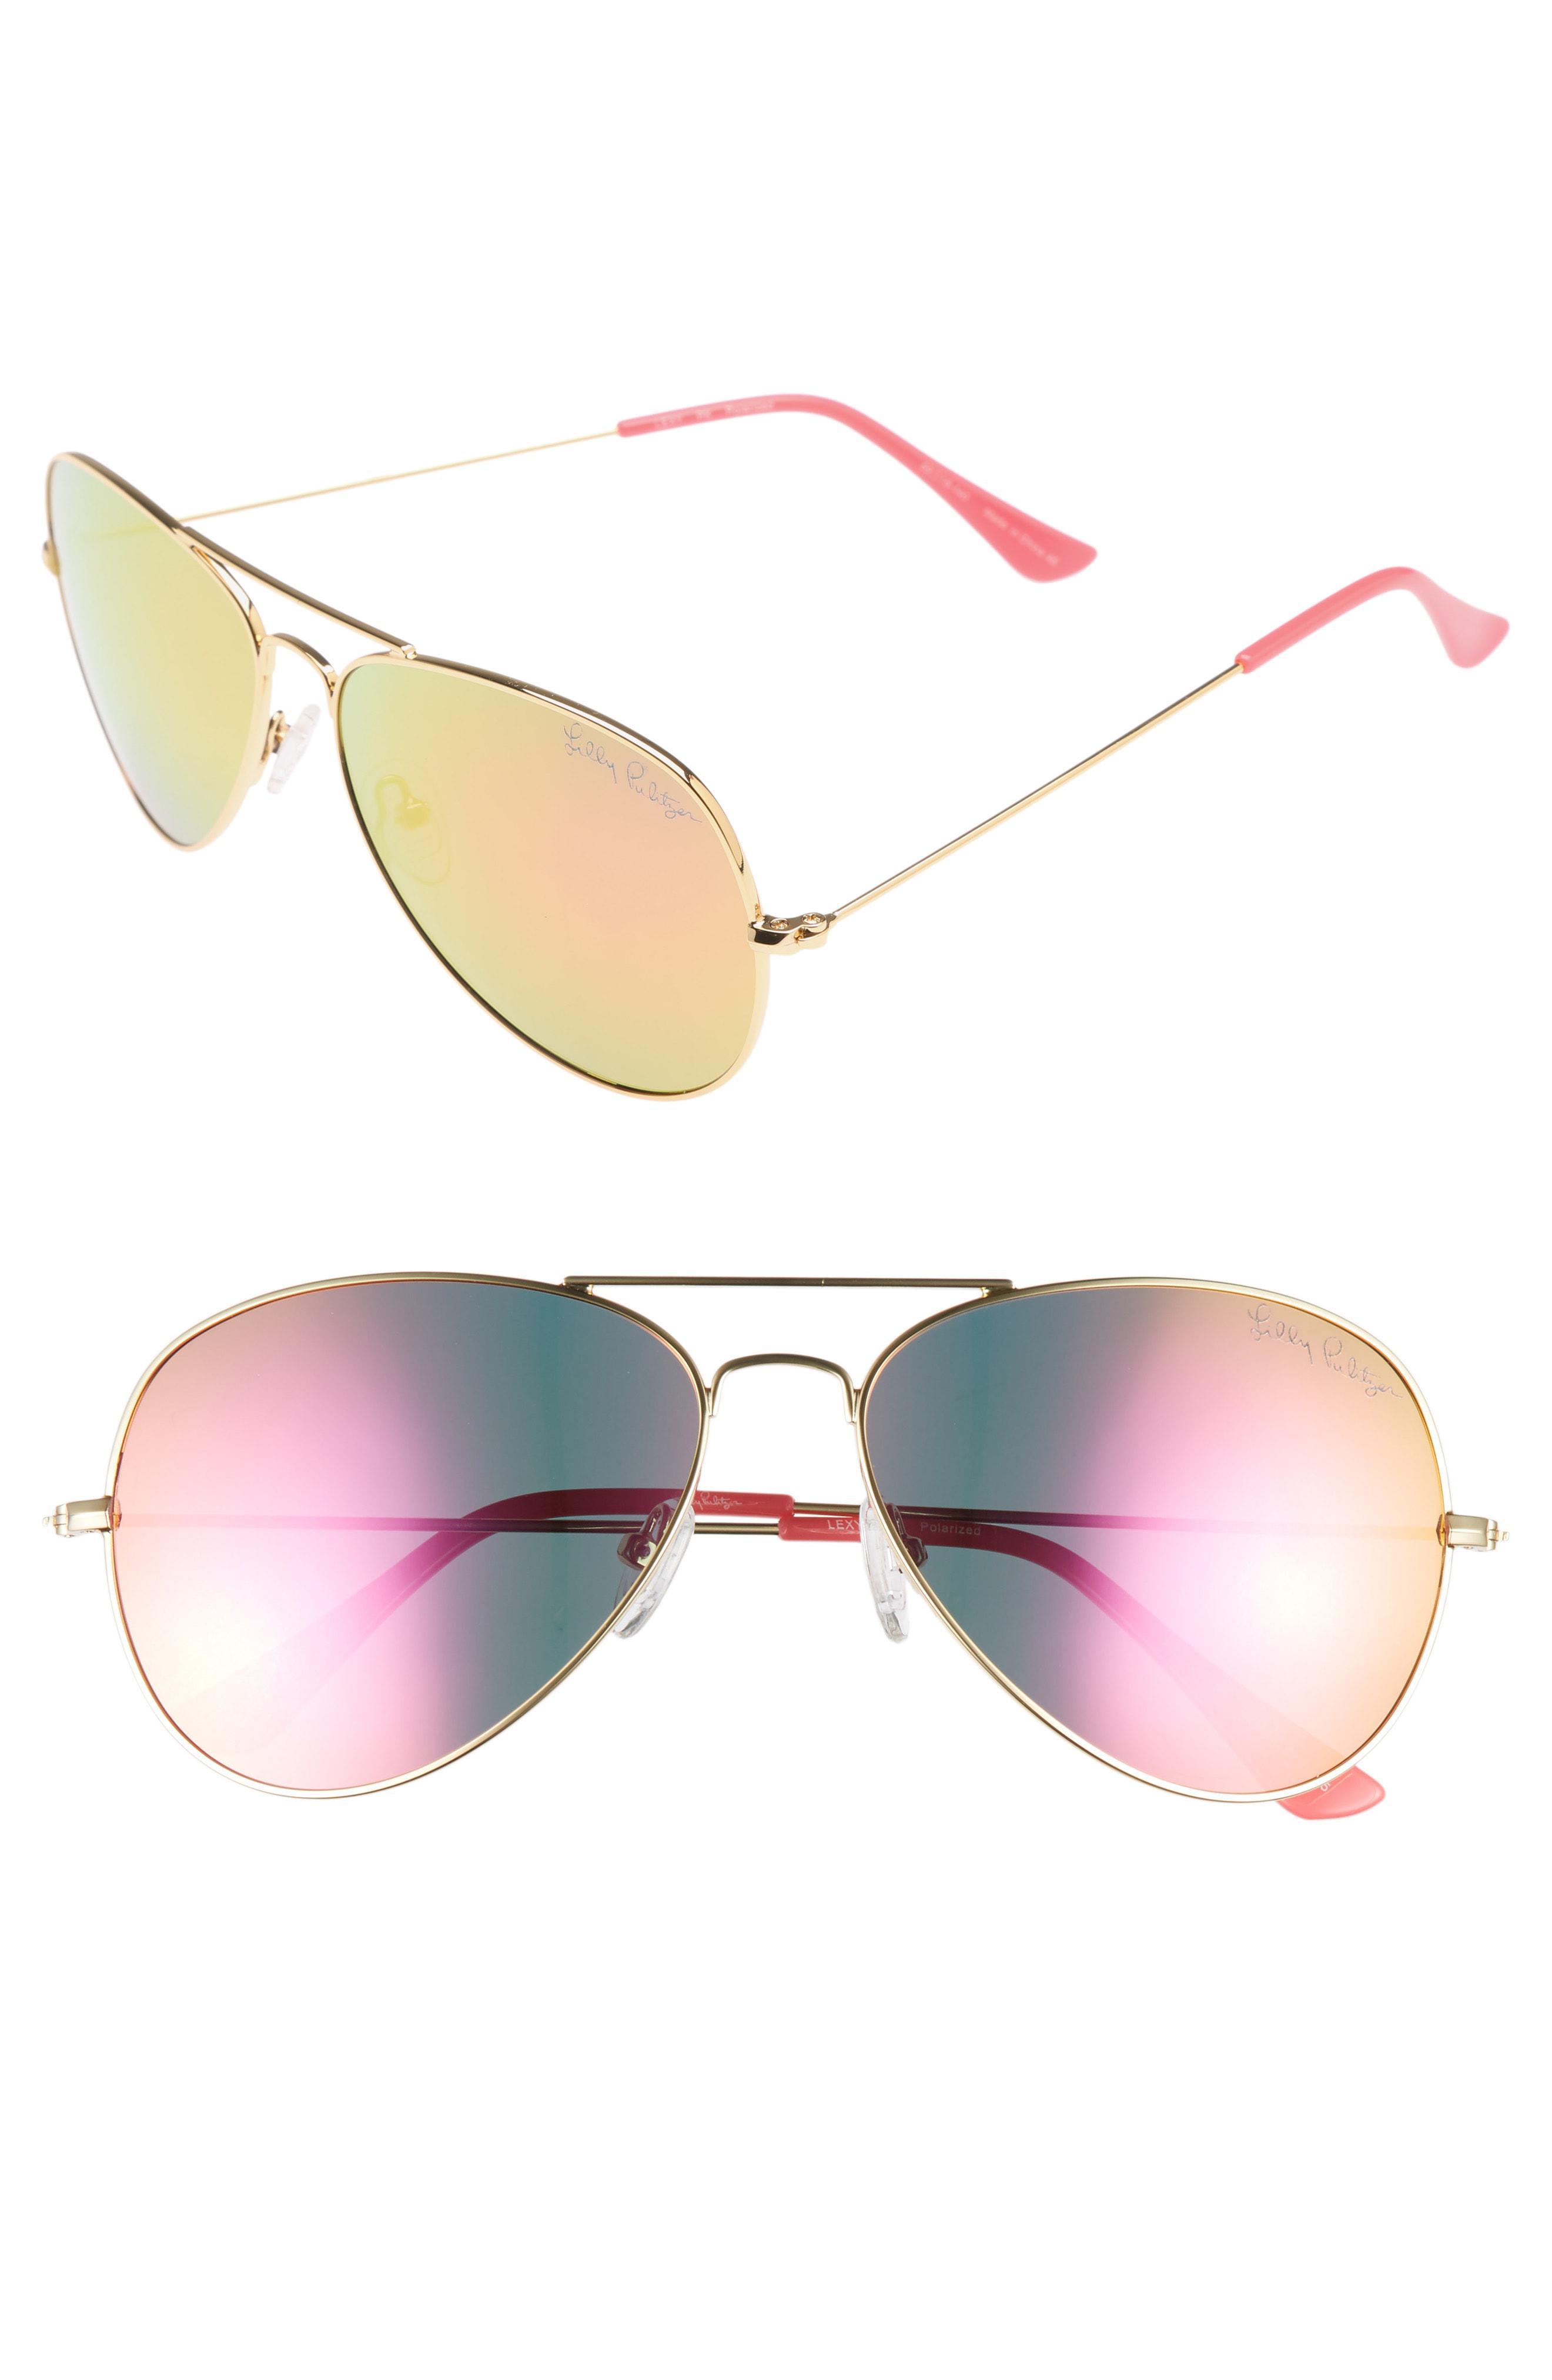 1f0c941dc4 Lilly Pulitzer. Women s Lilly Pulitzer Lexy 59mm Polarized Aviator  Sunglasses ...